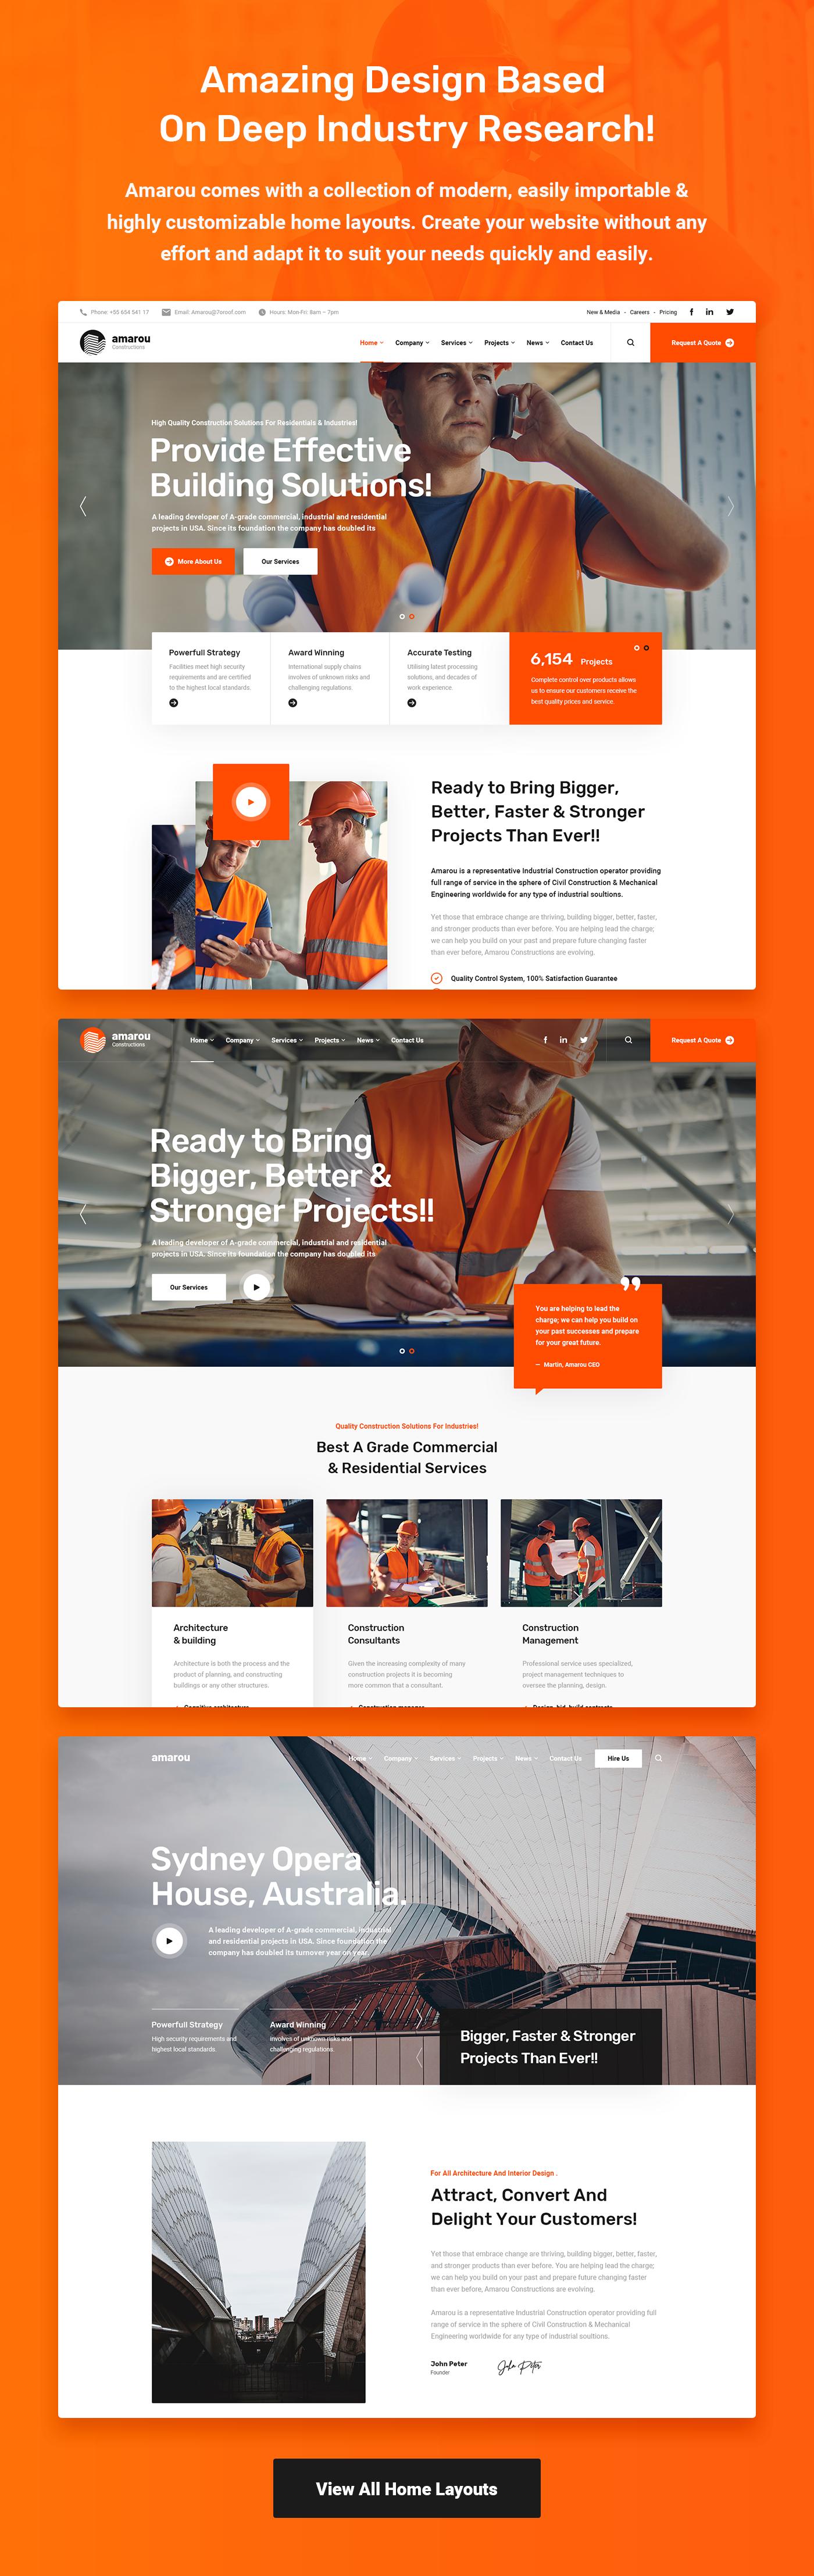 Amarou - Construction & Architecture WordPress Theme - 2